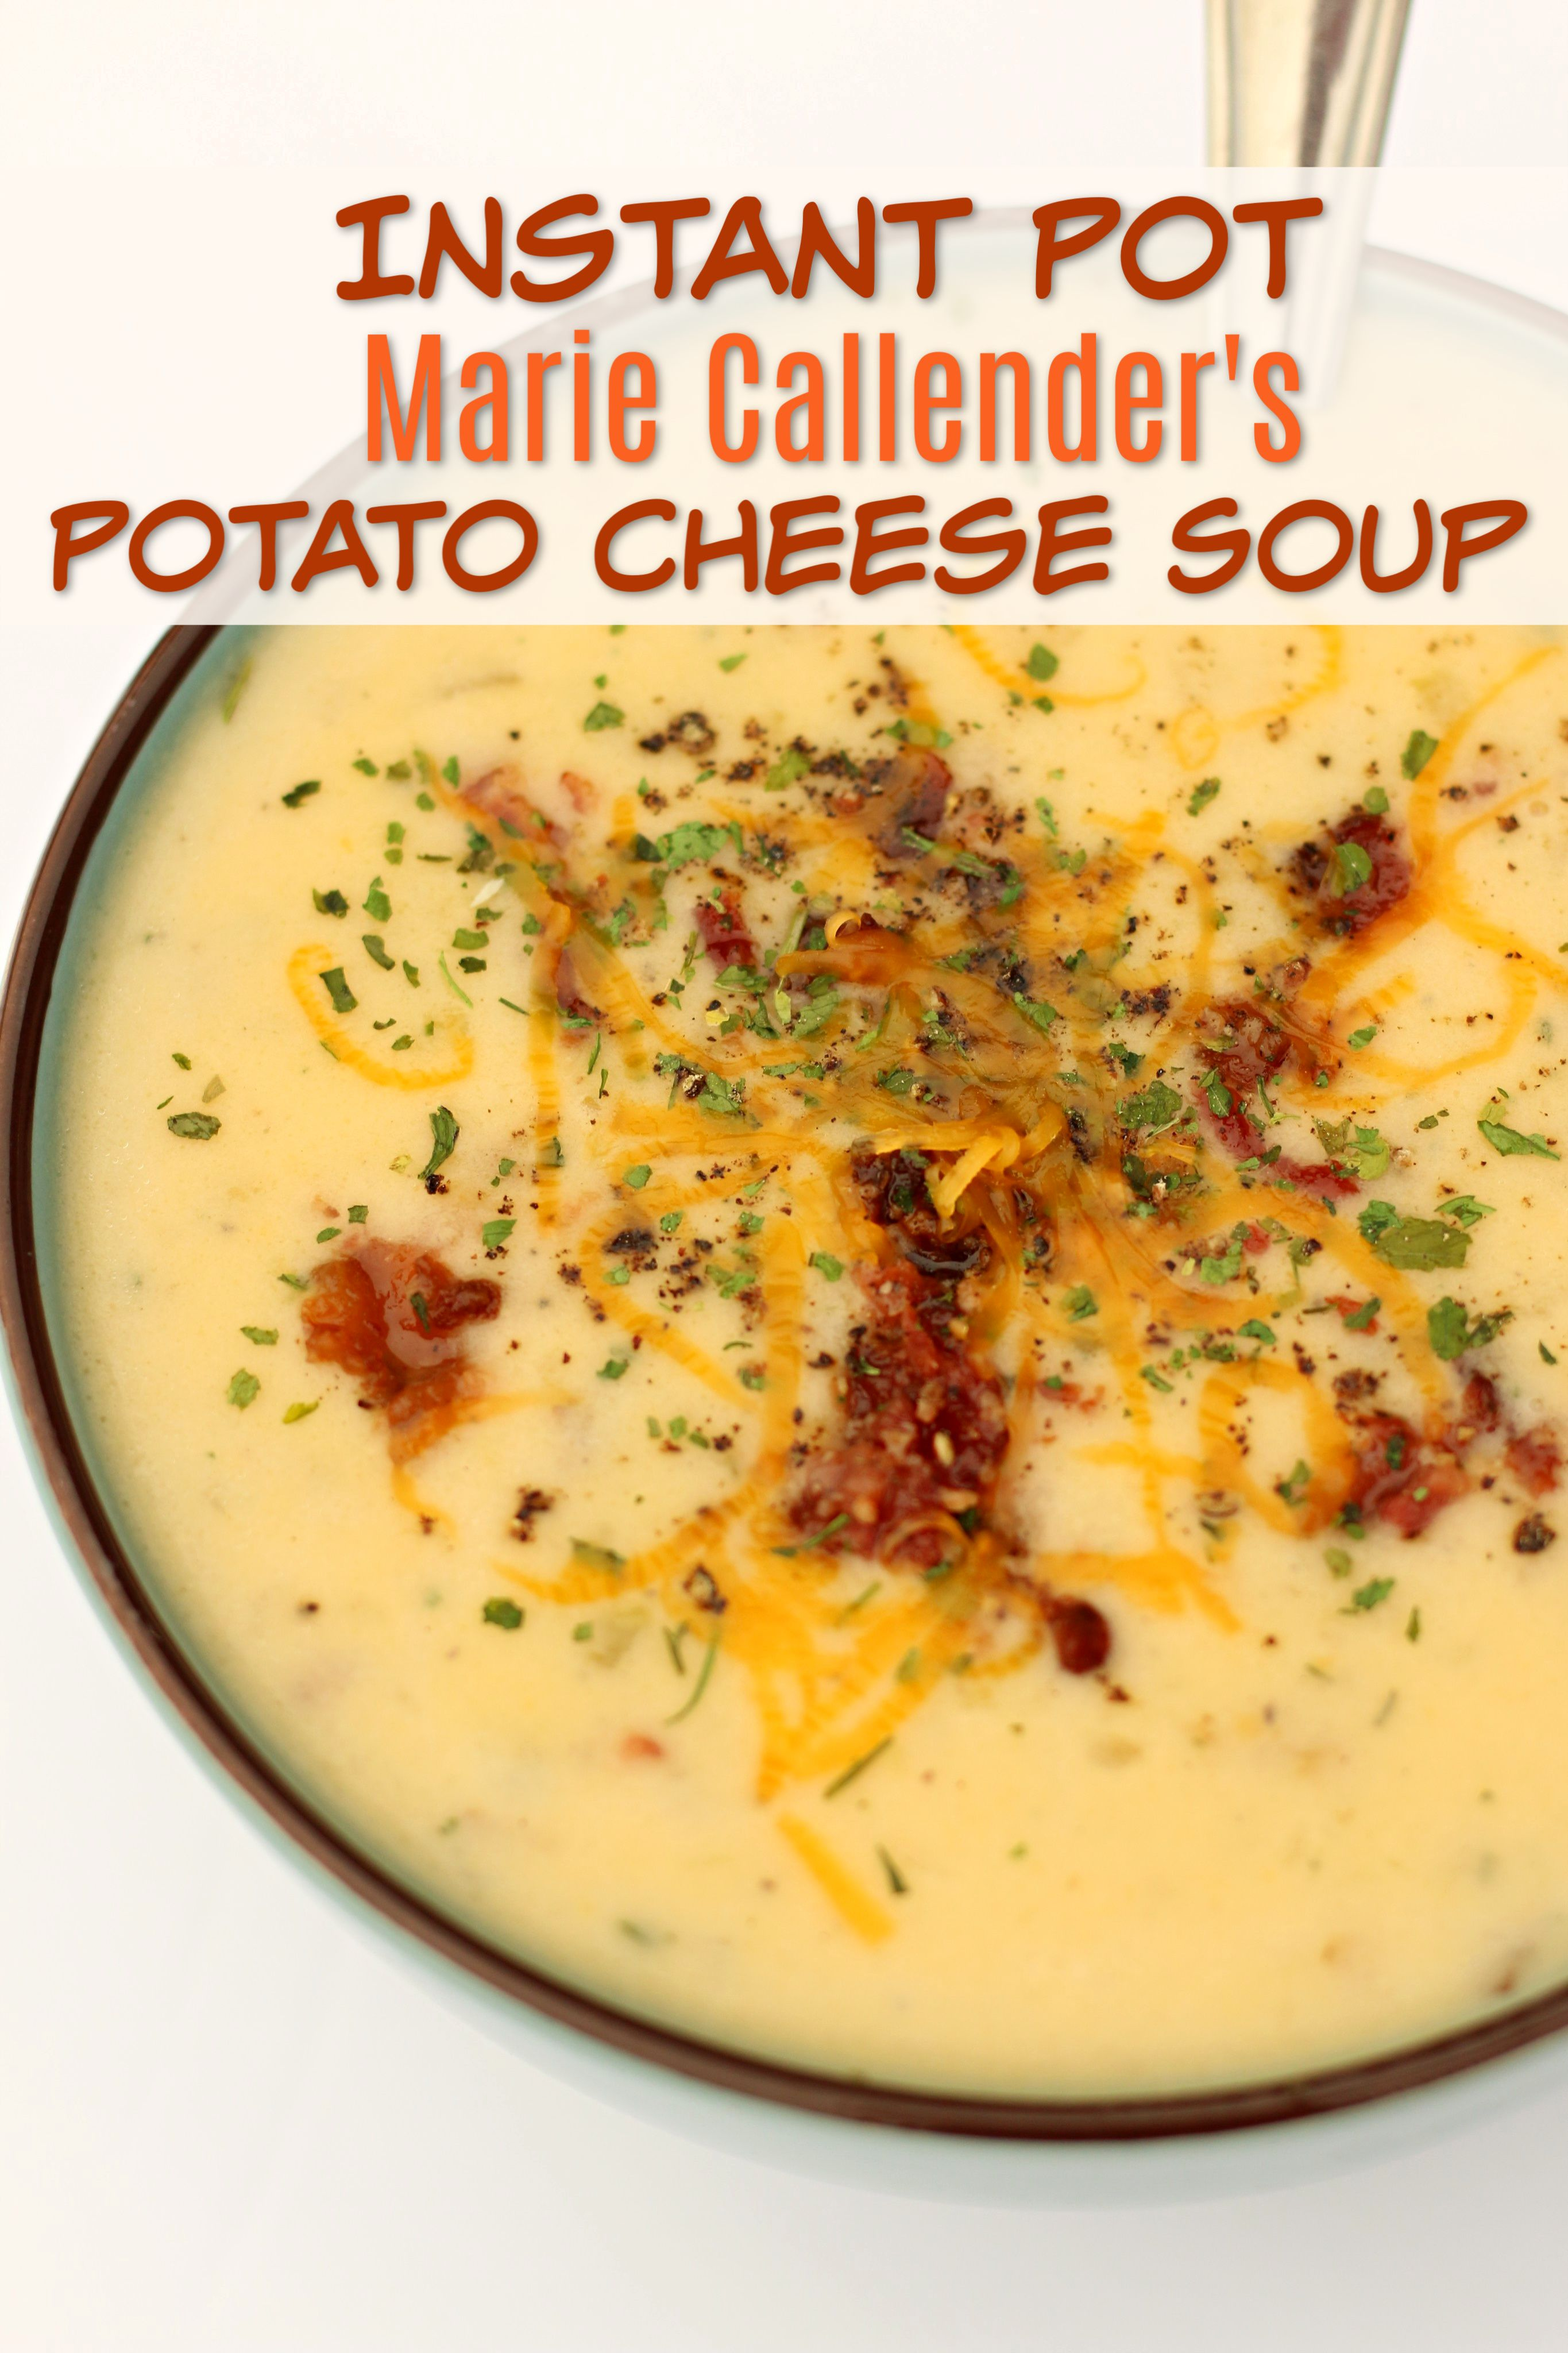 Instant Pot Marie Callender's Potato Cheese Soup